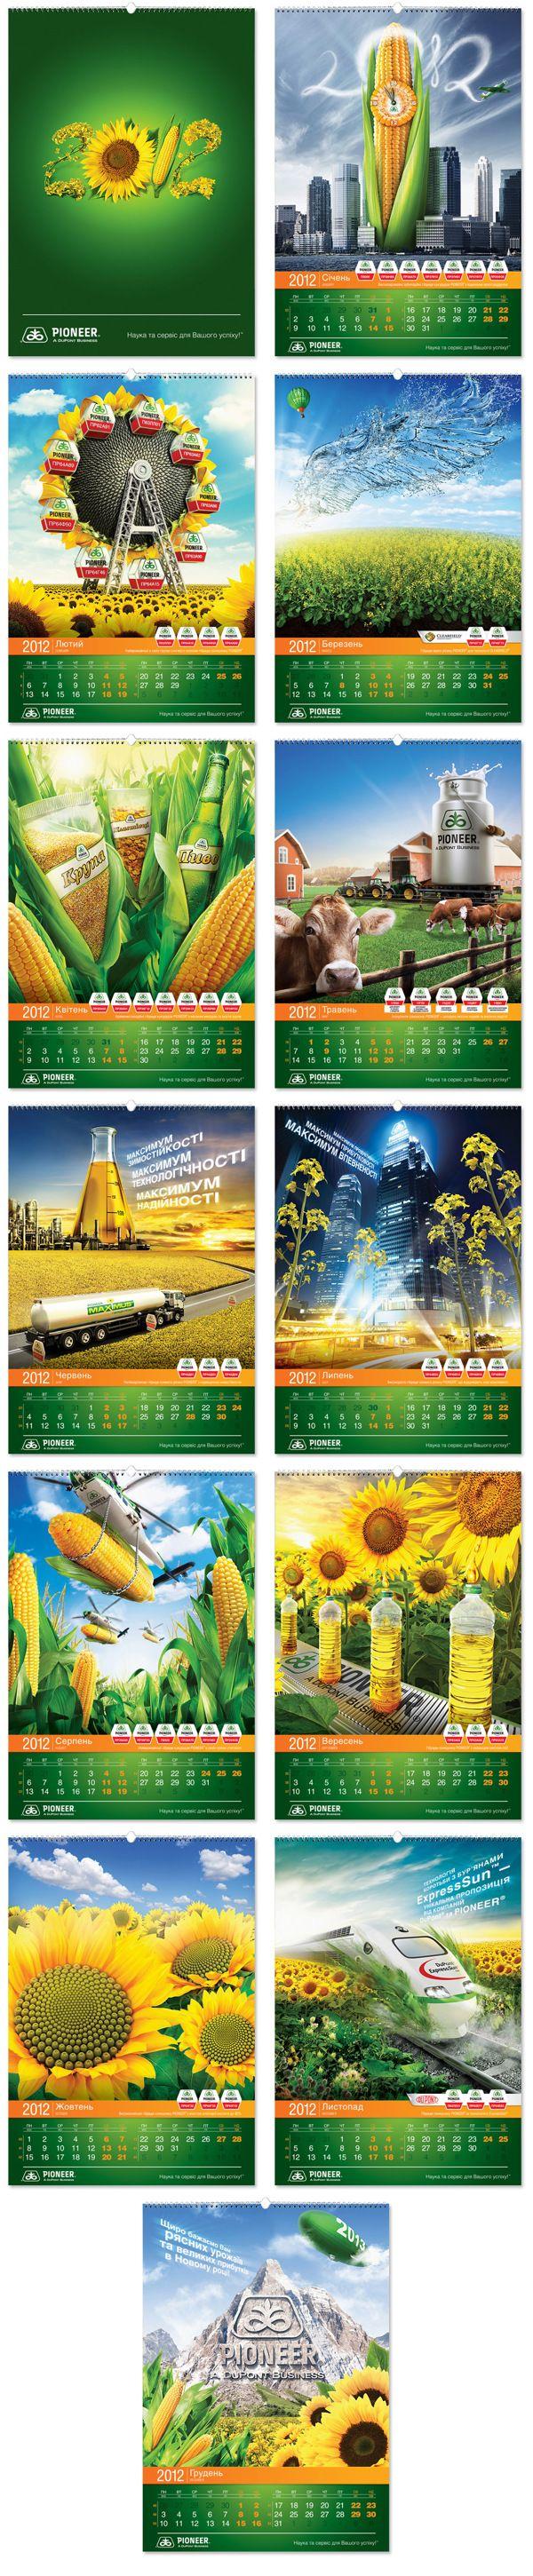 Pioneer. Corporate calendar design 2012. by Vitamin ADV, via Behance